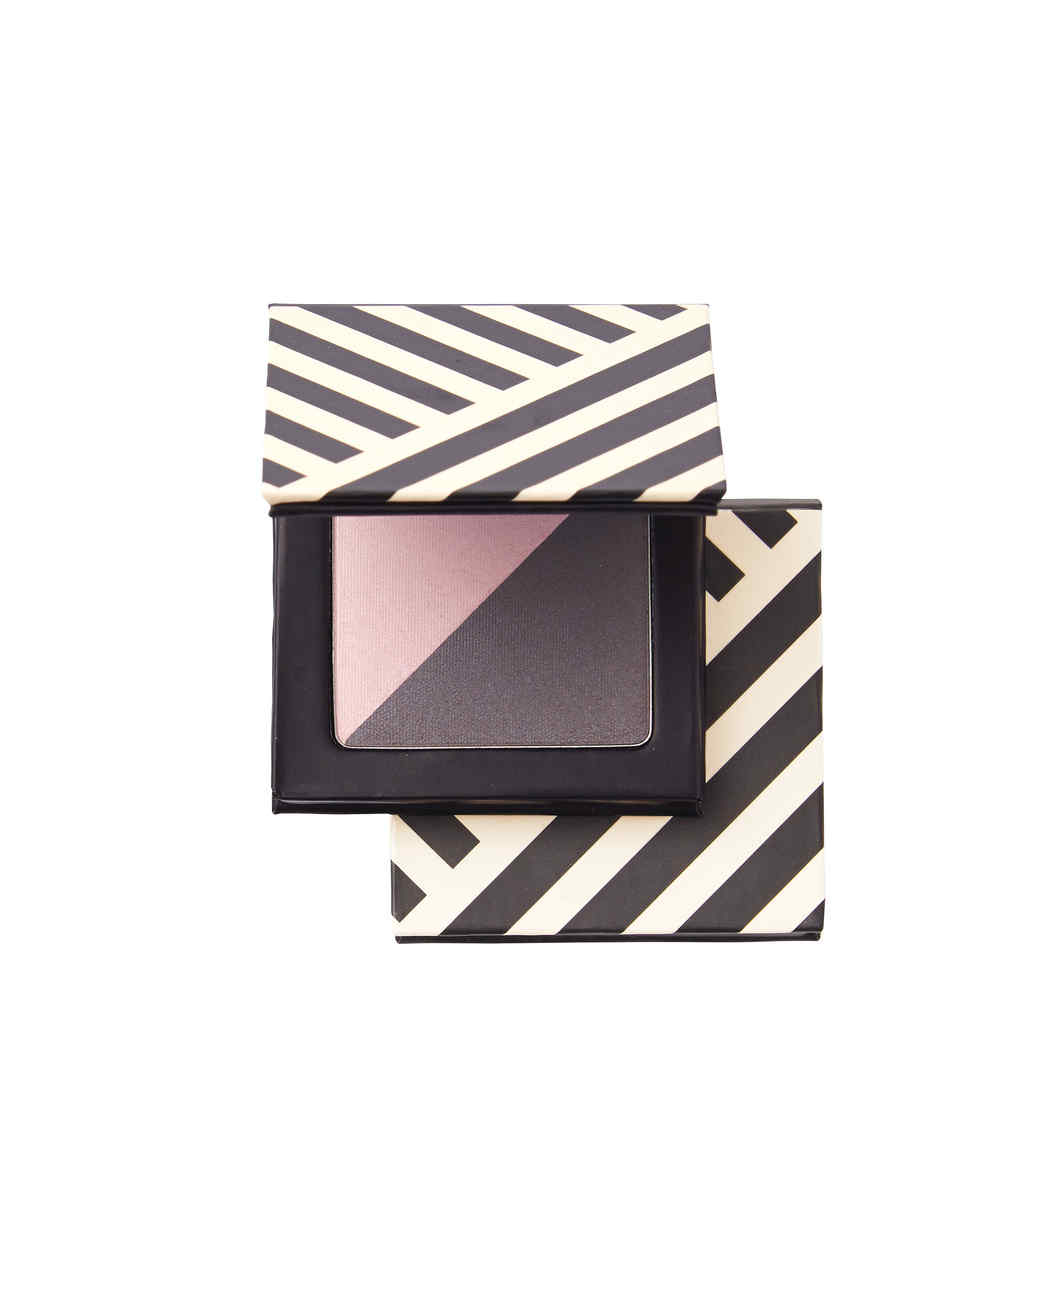 beauty-counter-eye-shadow-5118-d112774-0416.jpg